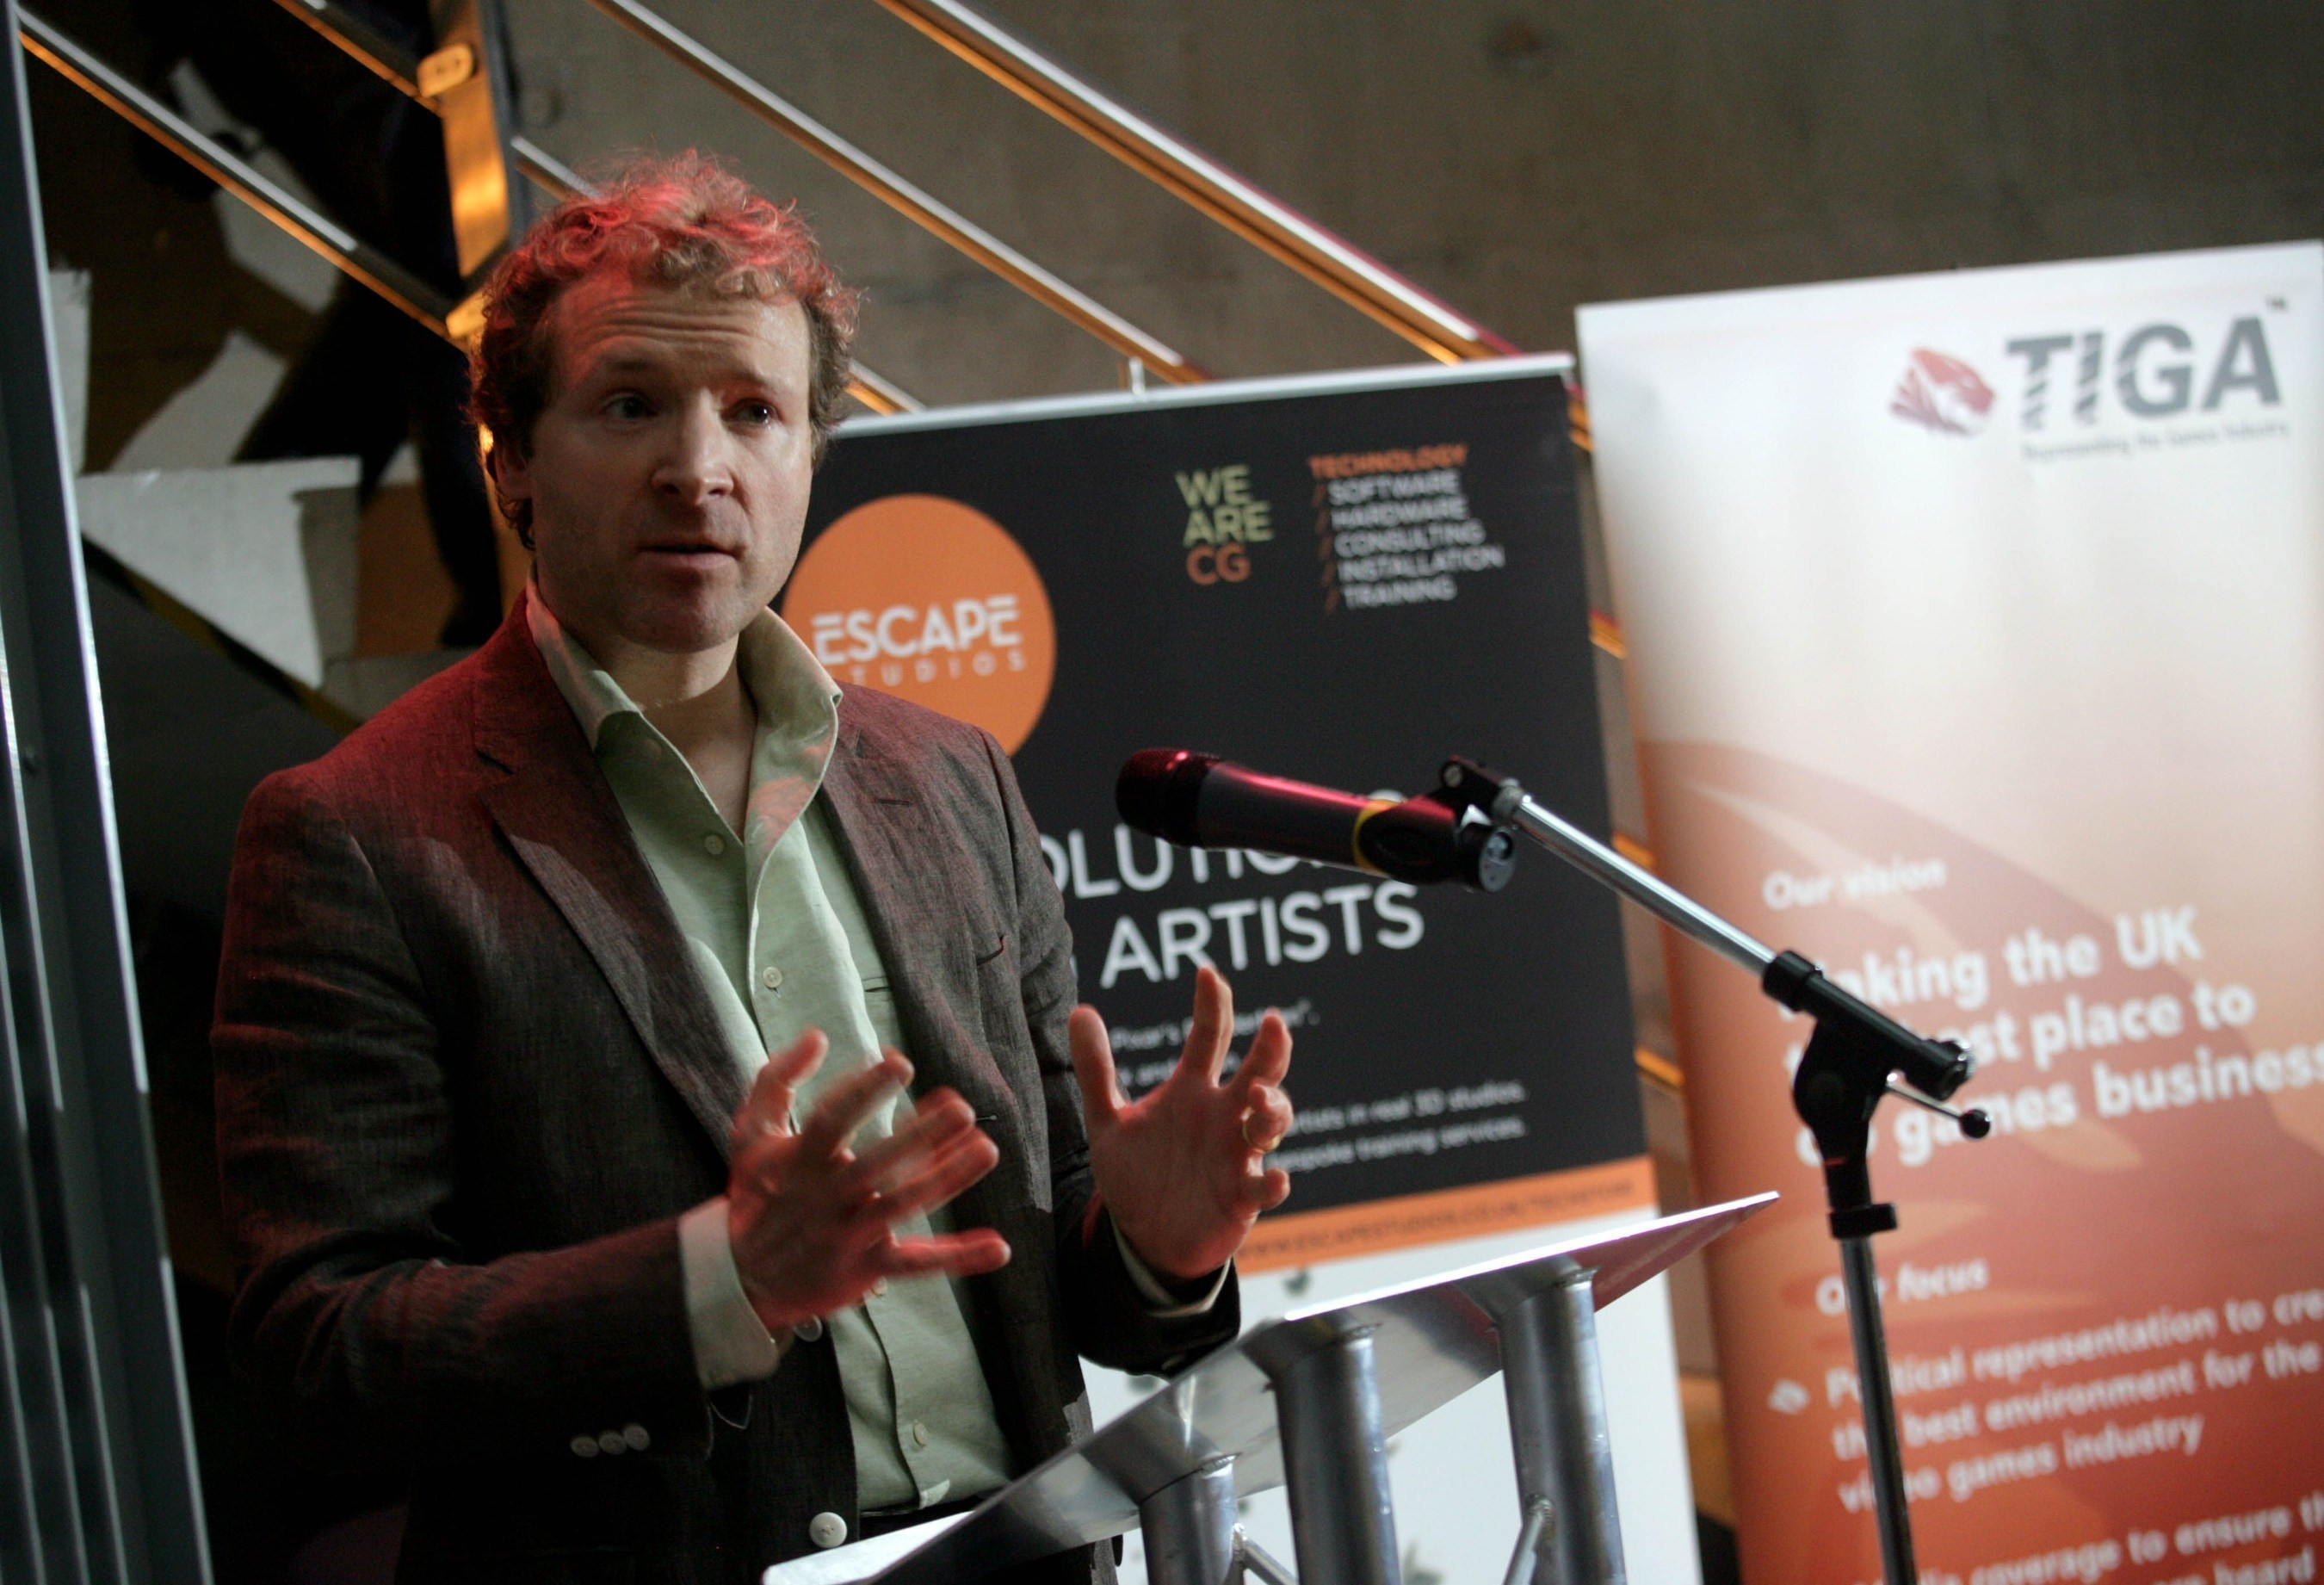 Dr Richard Wilson, CEO of the TIGA, the UK video games industry association (PRNewsFoto/TIGA)